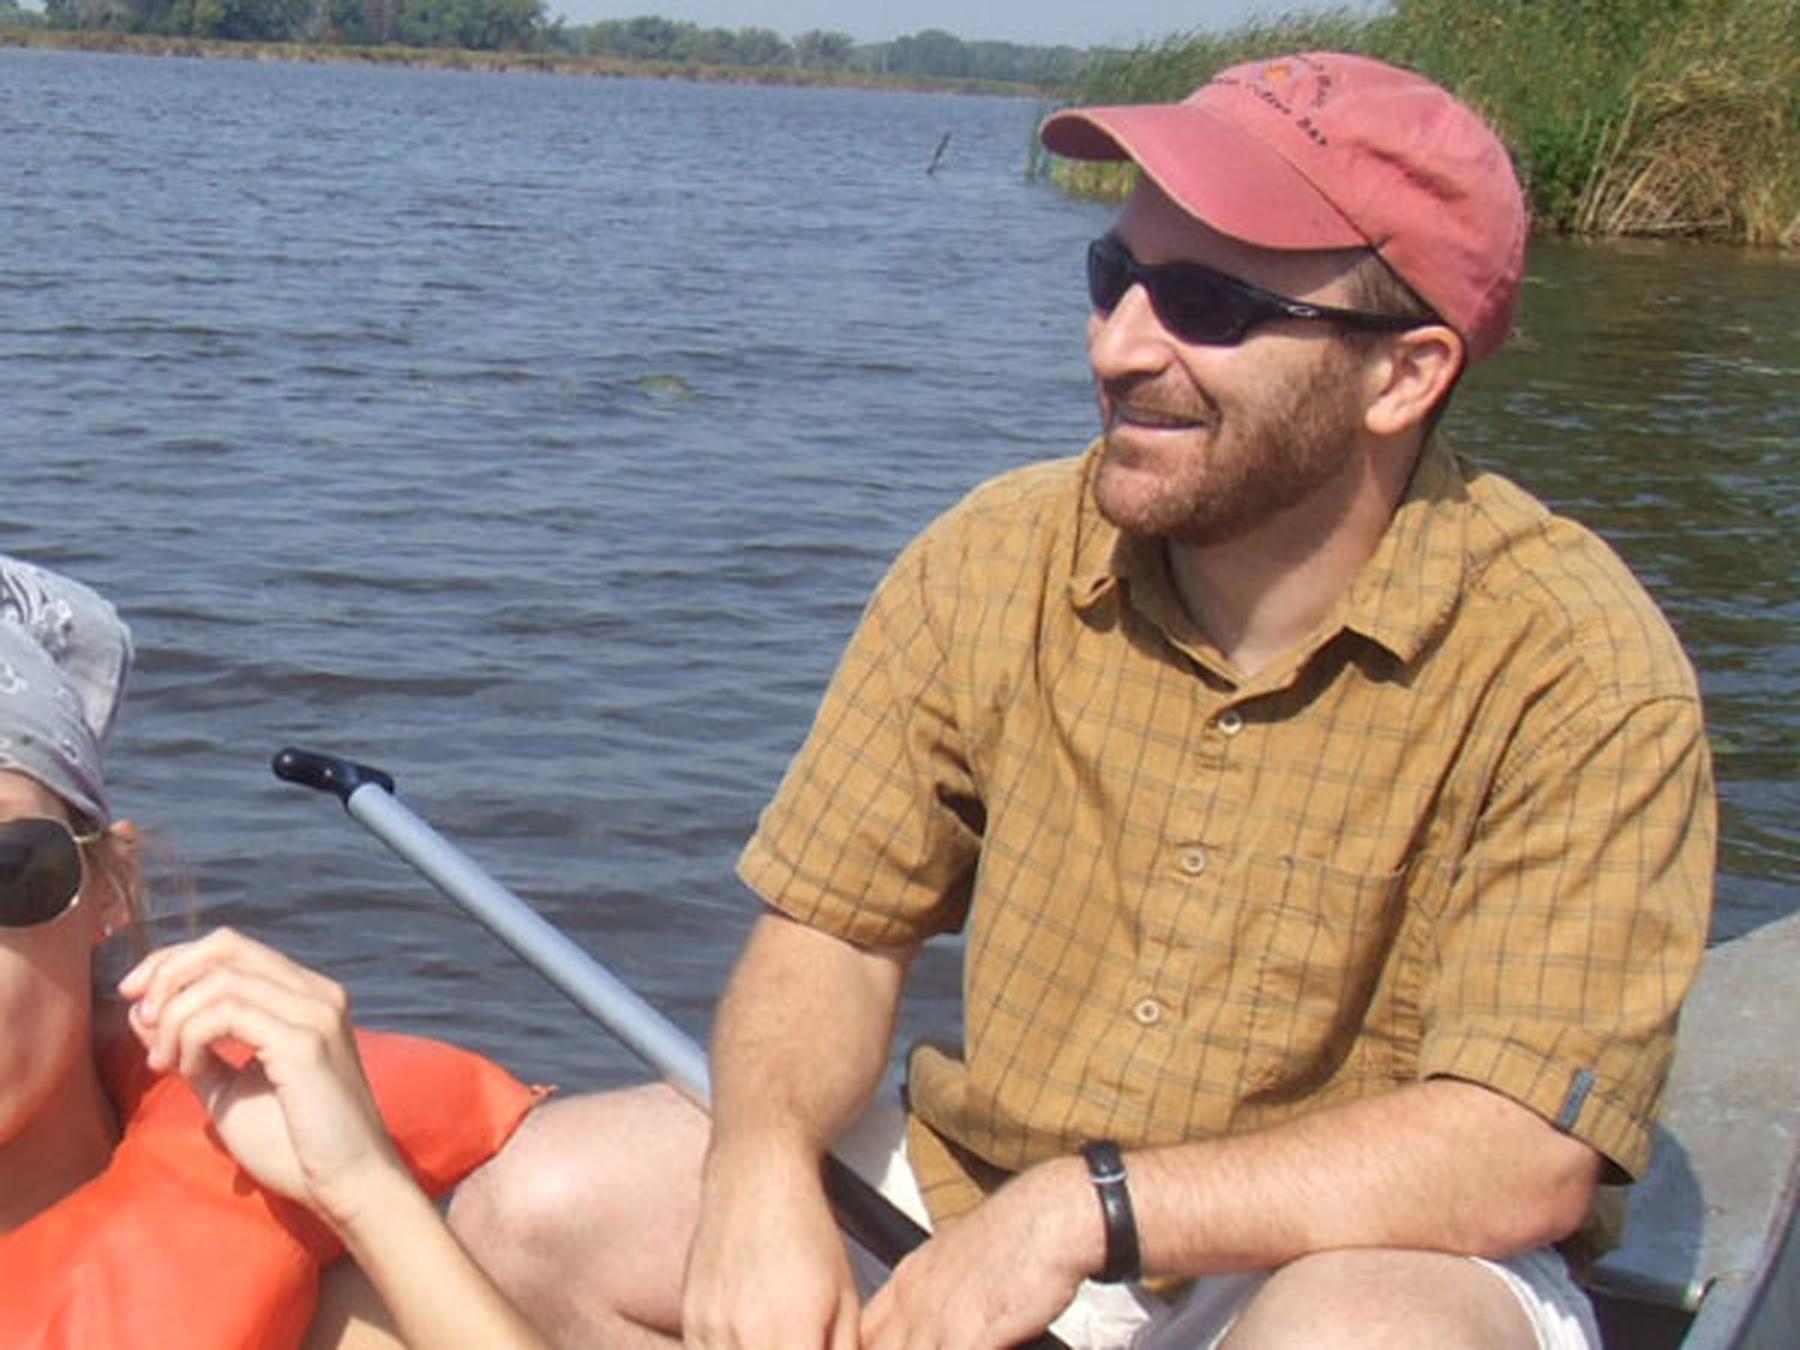 Jim Feldman paddling a canoe